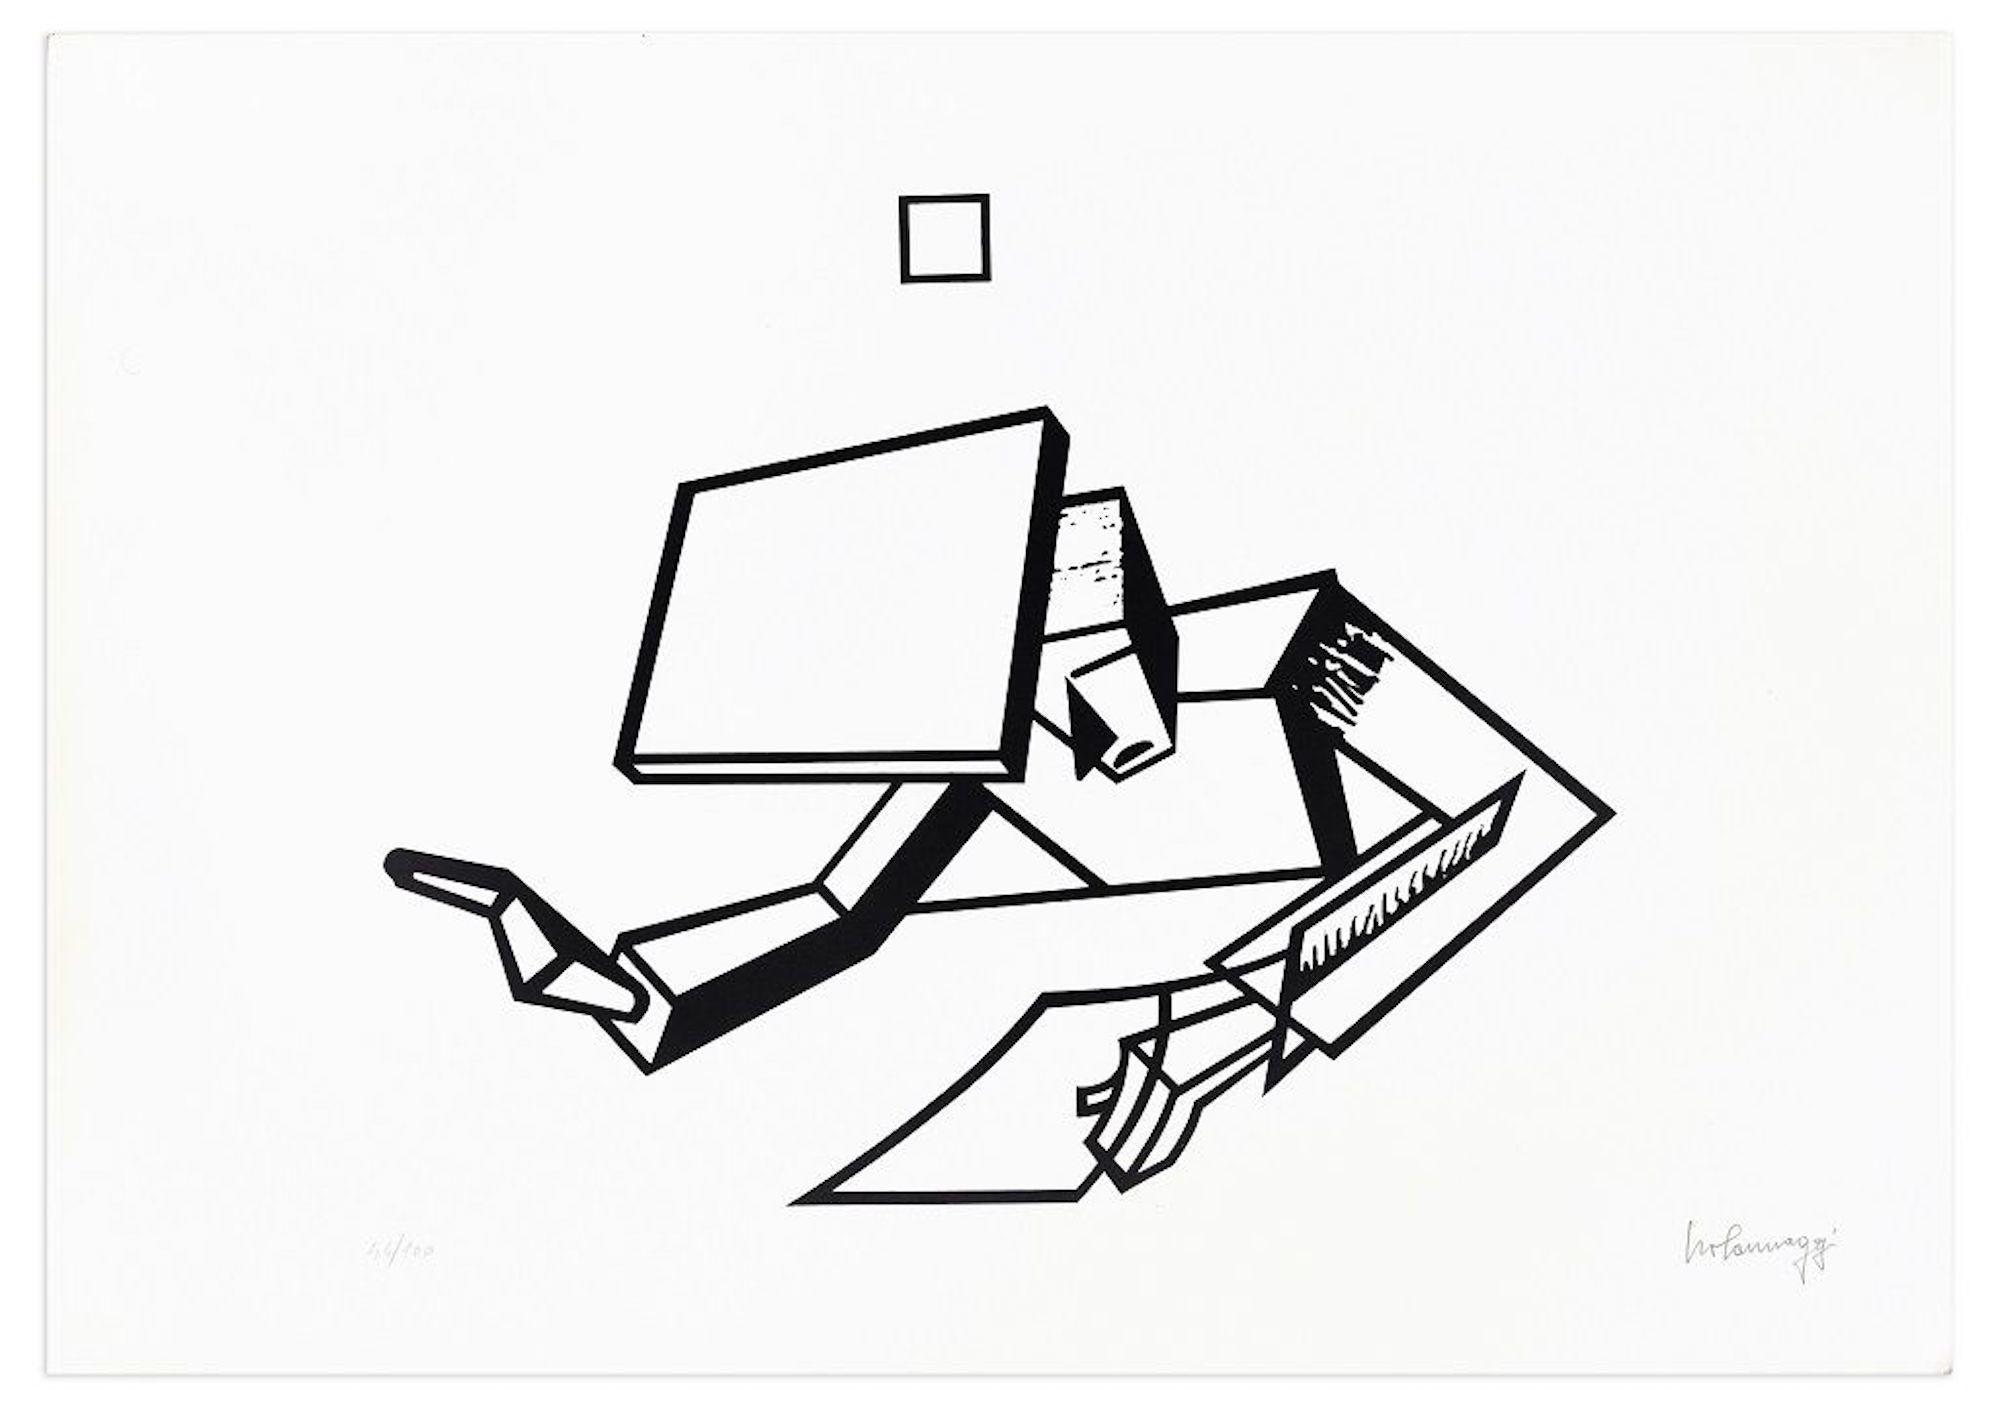 The Instigator - Original Lithograph by Ivo Pannaggi - 1975 ca.